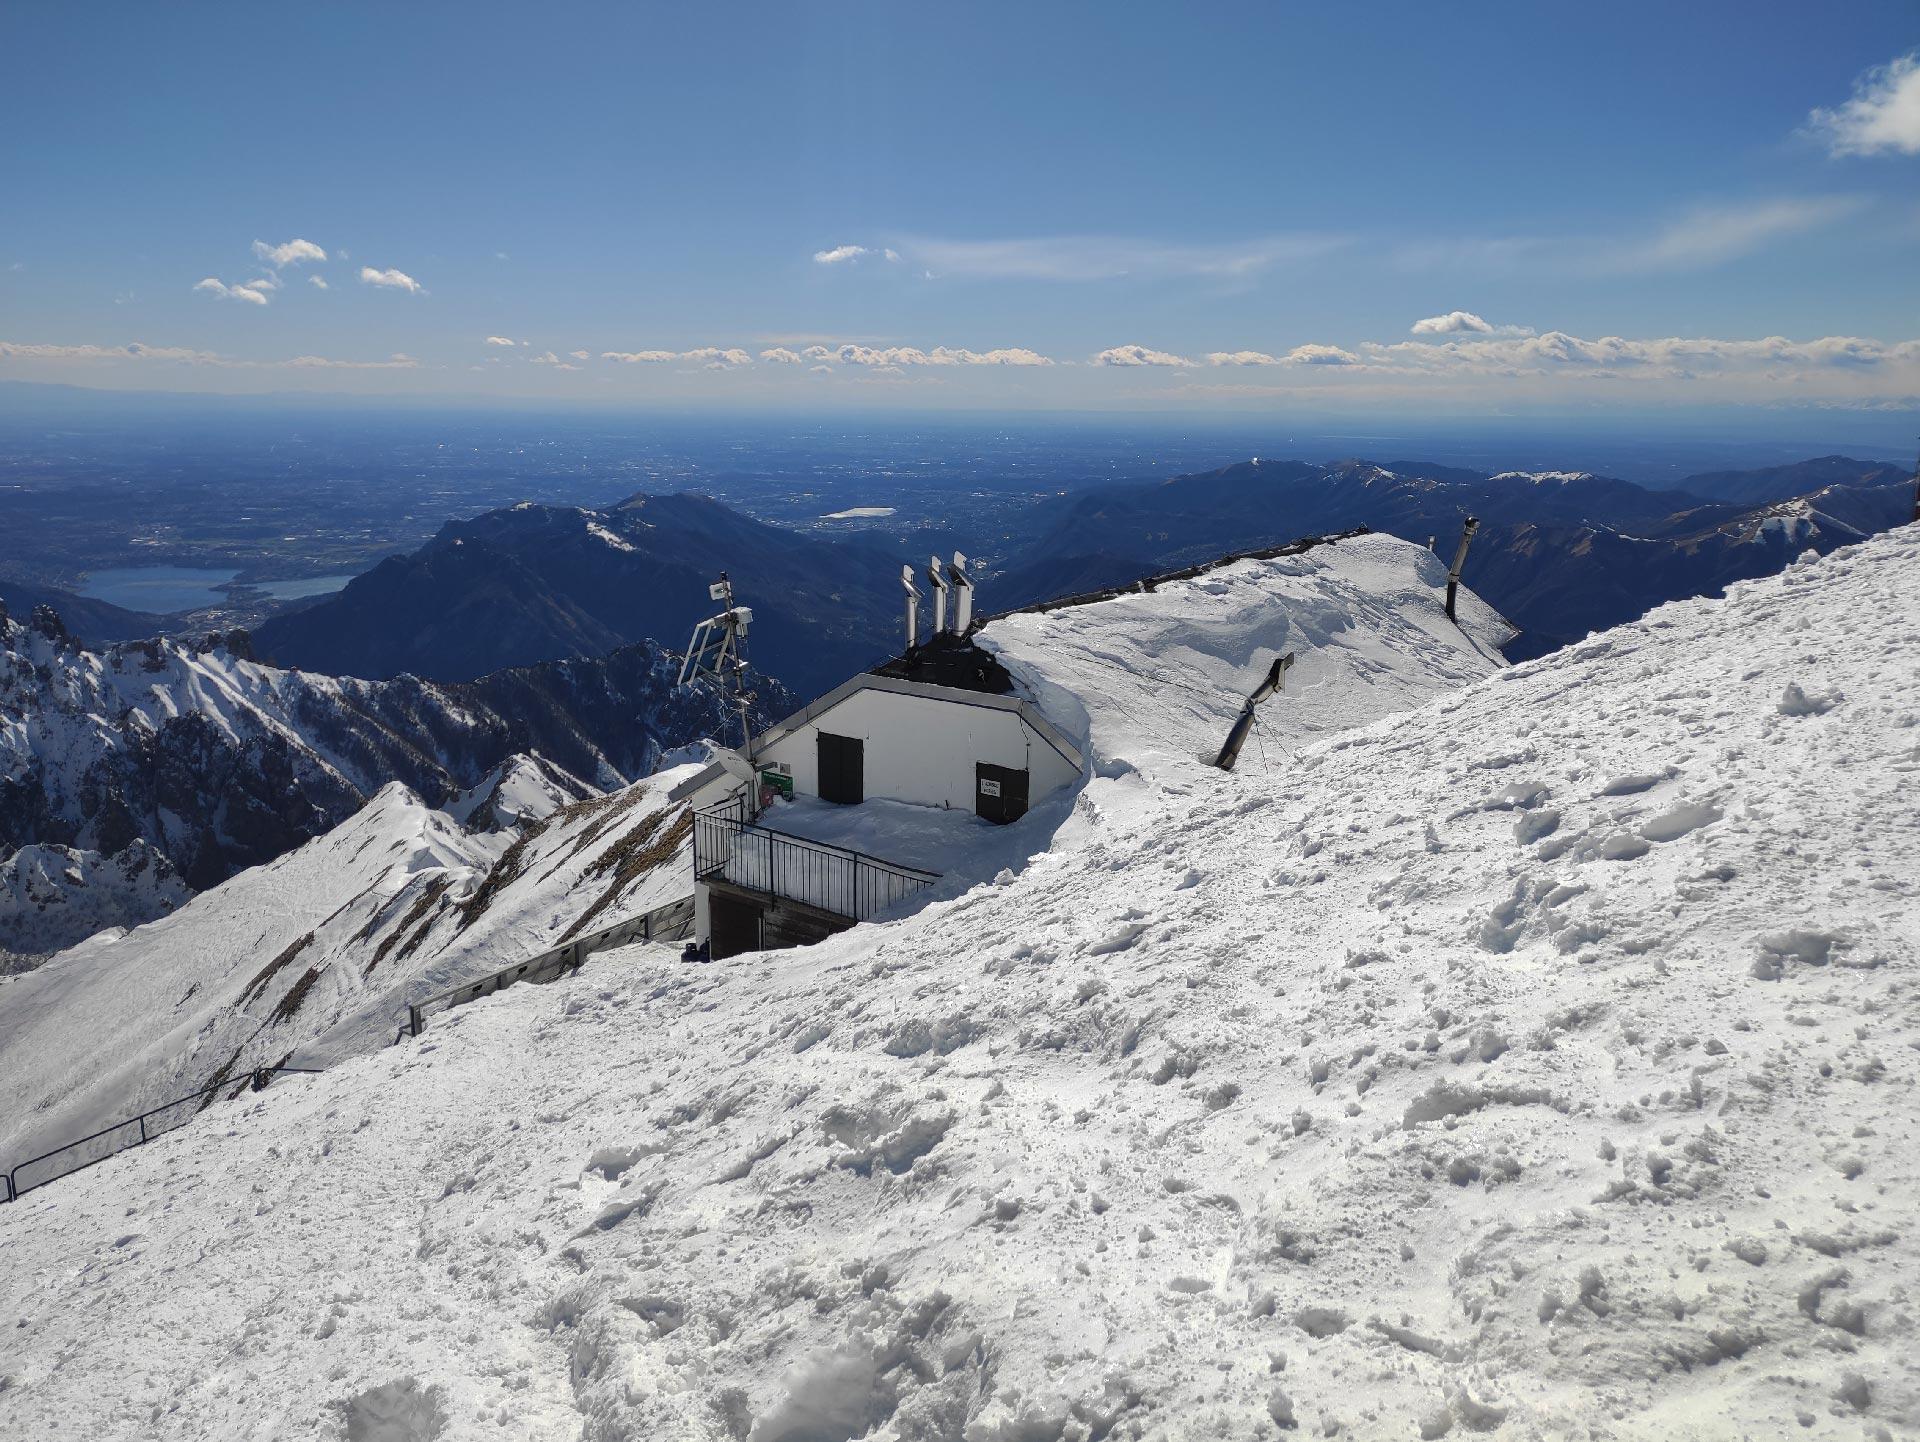 Trekking invernali in Valsassina: veduta del Rifugio Brioschi